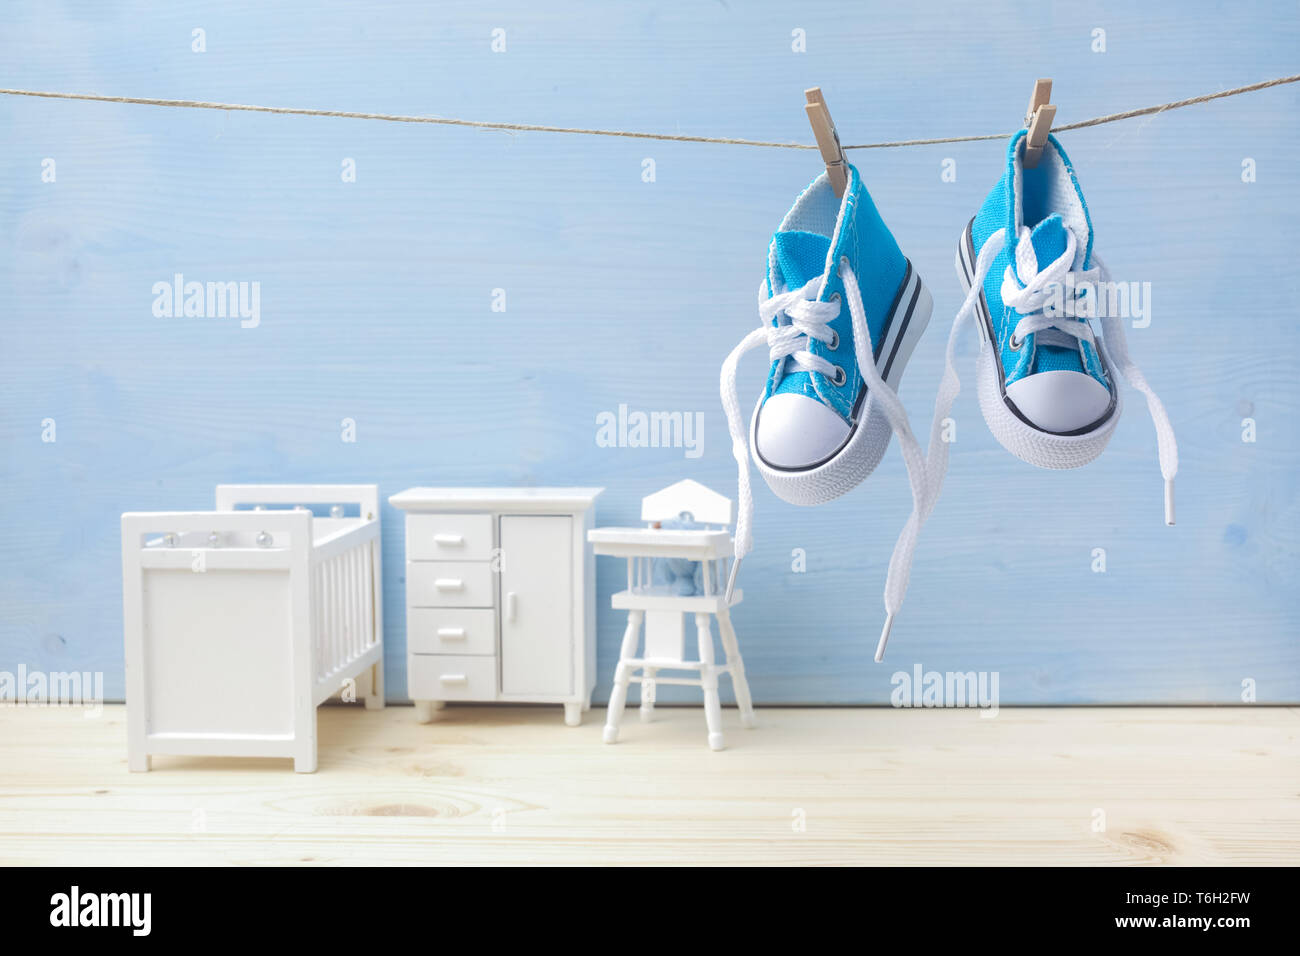 Cute Little Baby Shoes Hanghang Sur Corde En Arriere Plan